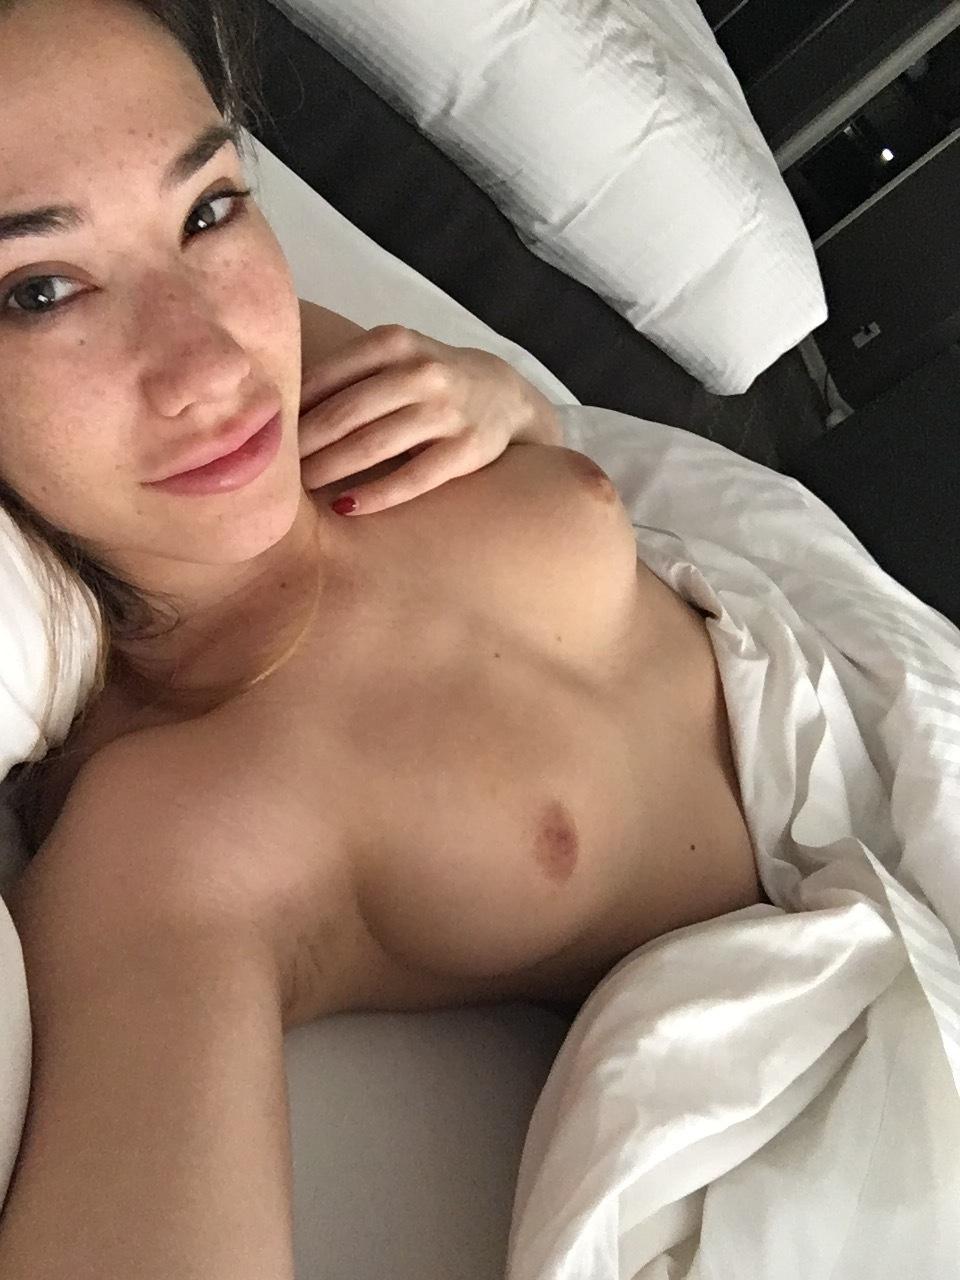 Eva Lovia, Fallinlovia, Onlyfans 0104